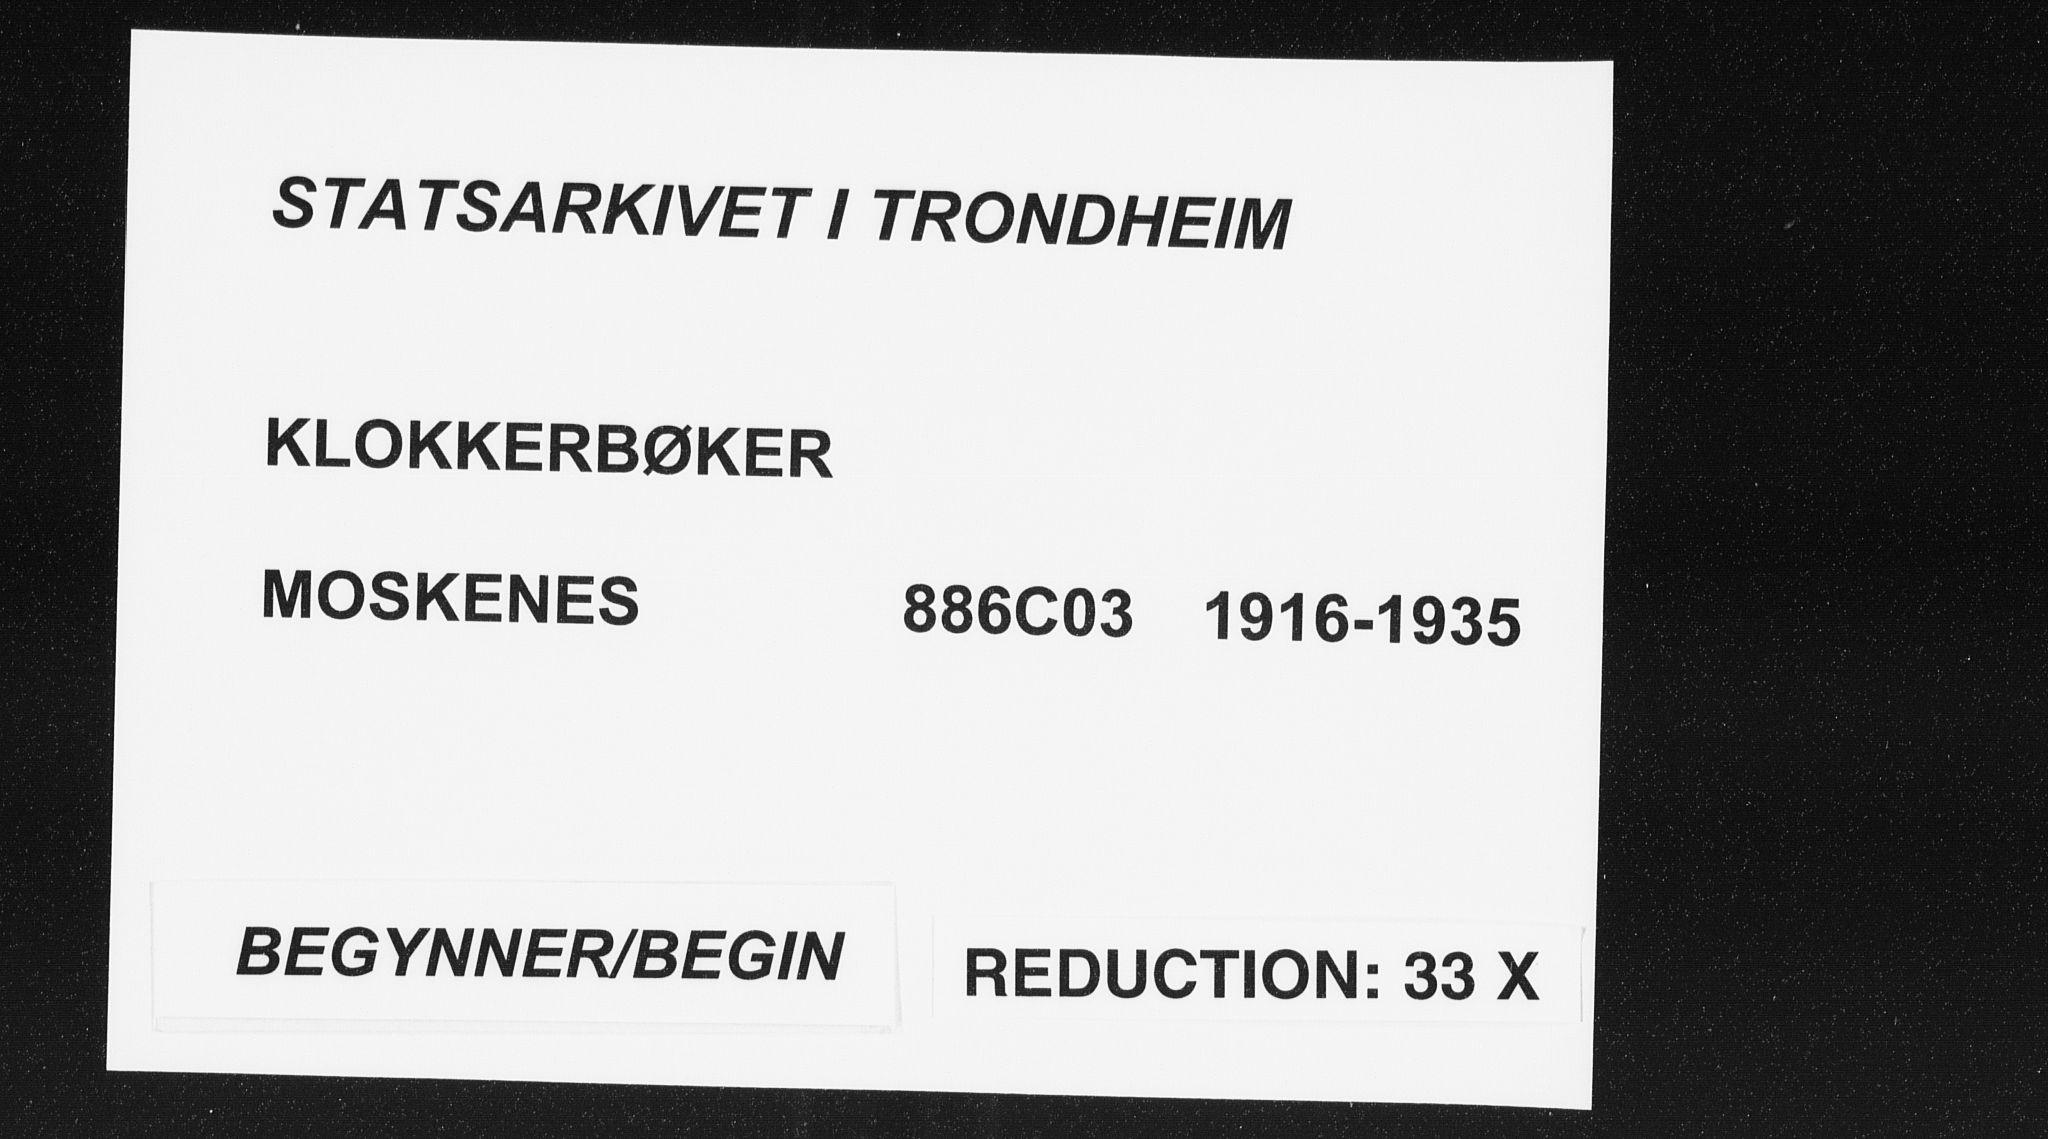 SAT, Ministerialprotokoller, klokkerbøker og fødselsregistre - Nordland, 886/L1226: Klokkerbok nr. 886C03, 1916-1935